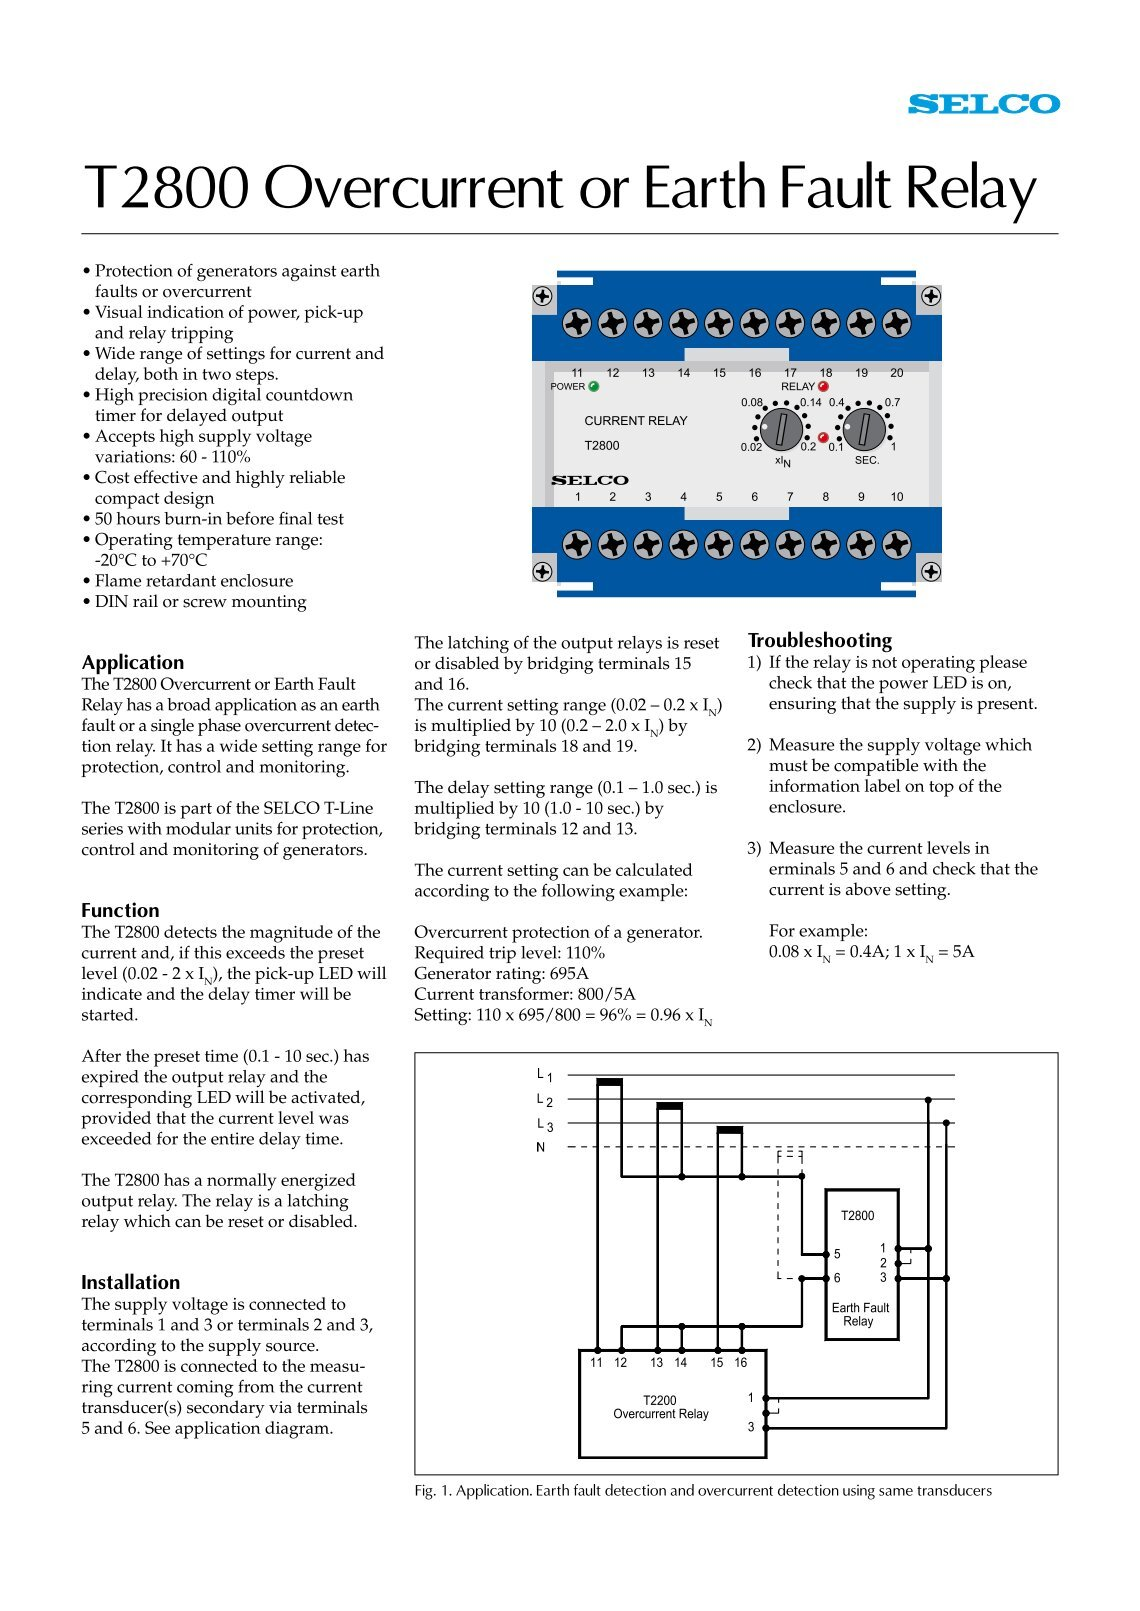 580k backhoe parts wiring diagram massey ferguson wiring schematic case 570lxt fuel system [ 1140 x 1613 Pixel ]